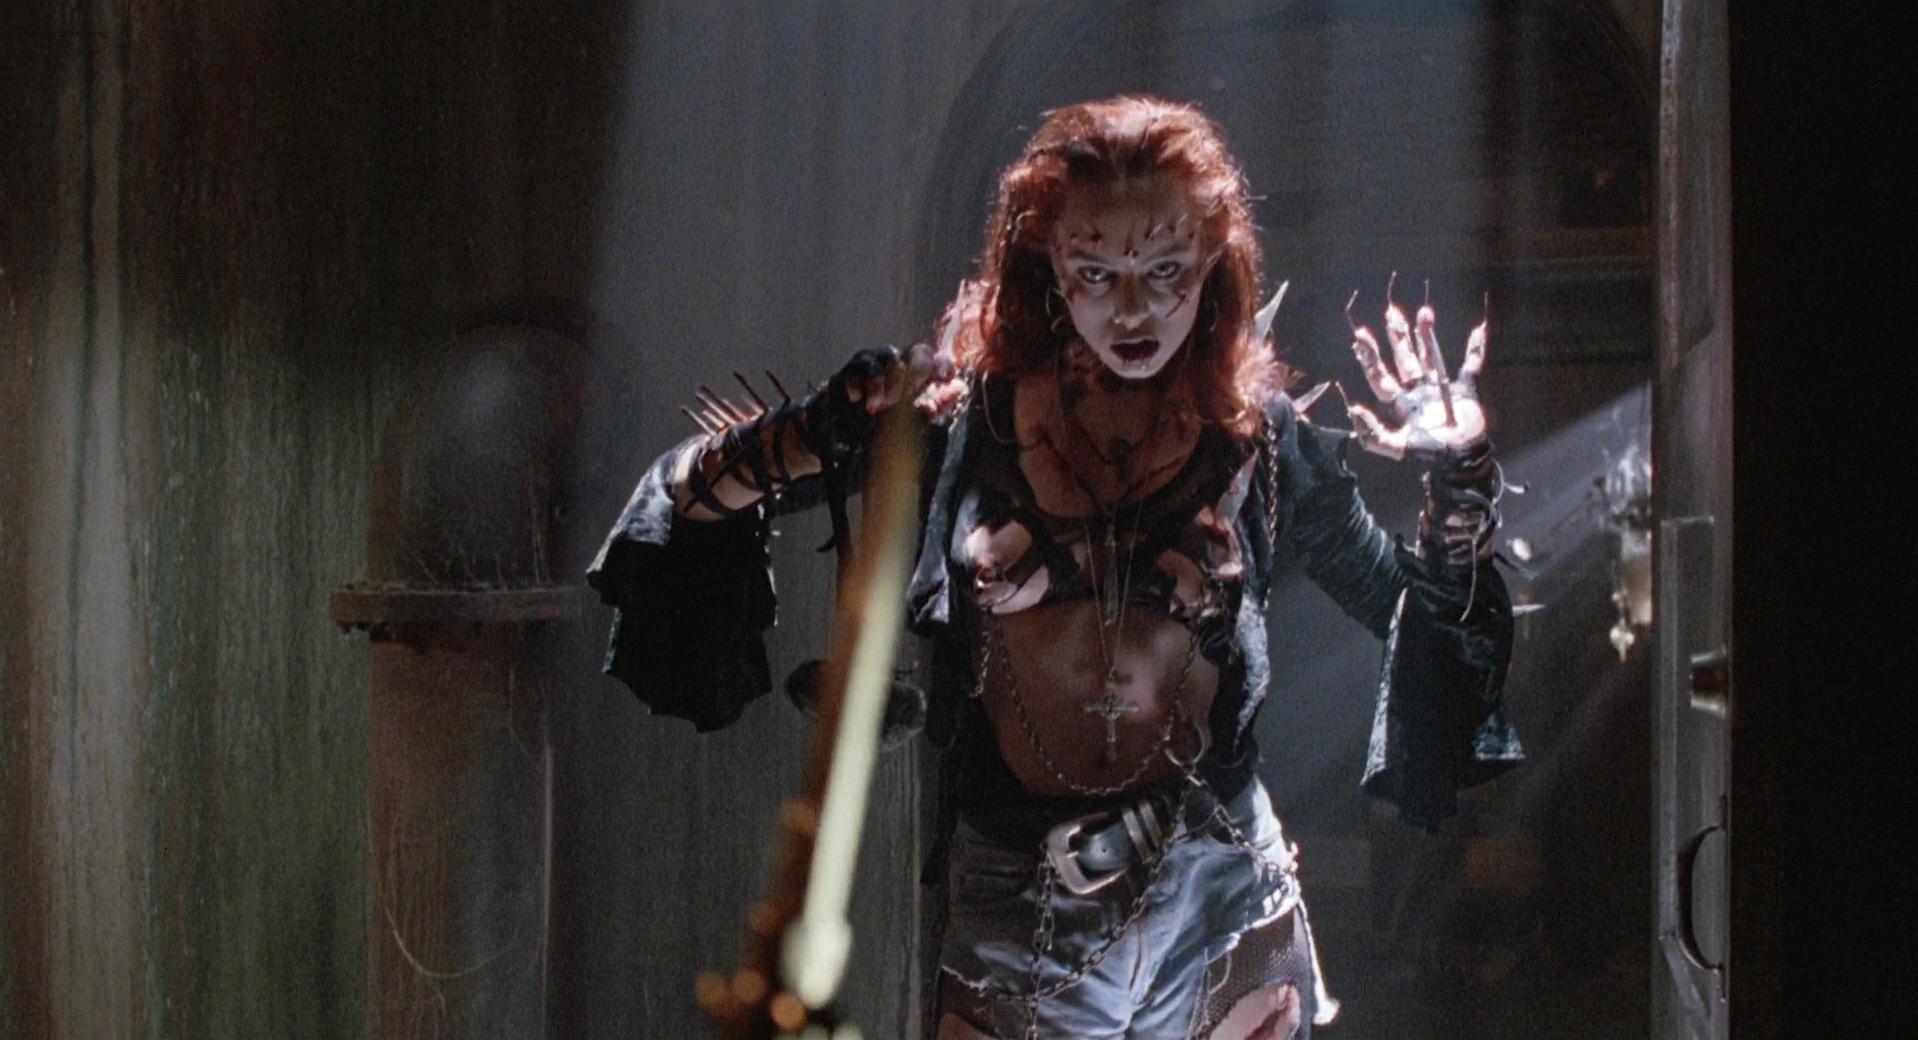 Melinda Clarke nude - Return Of The Living Dead 3 (1993)